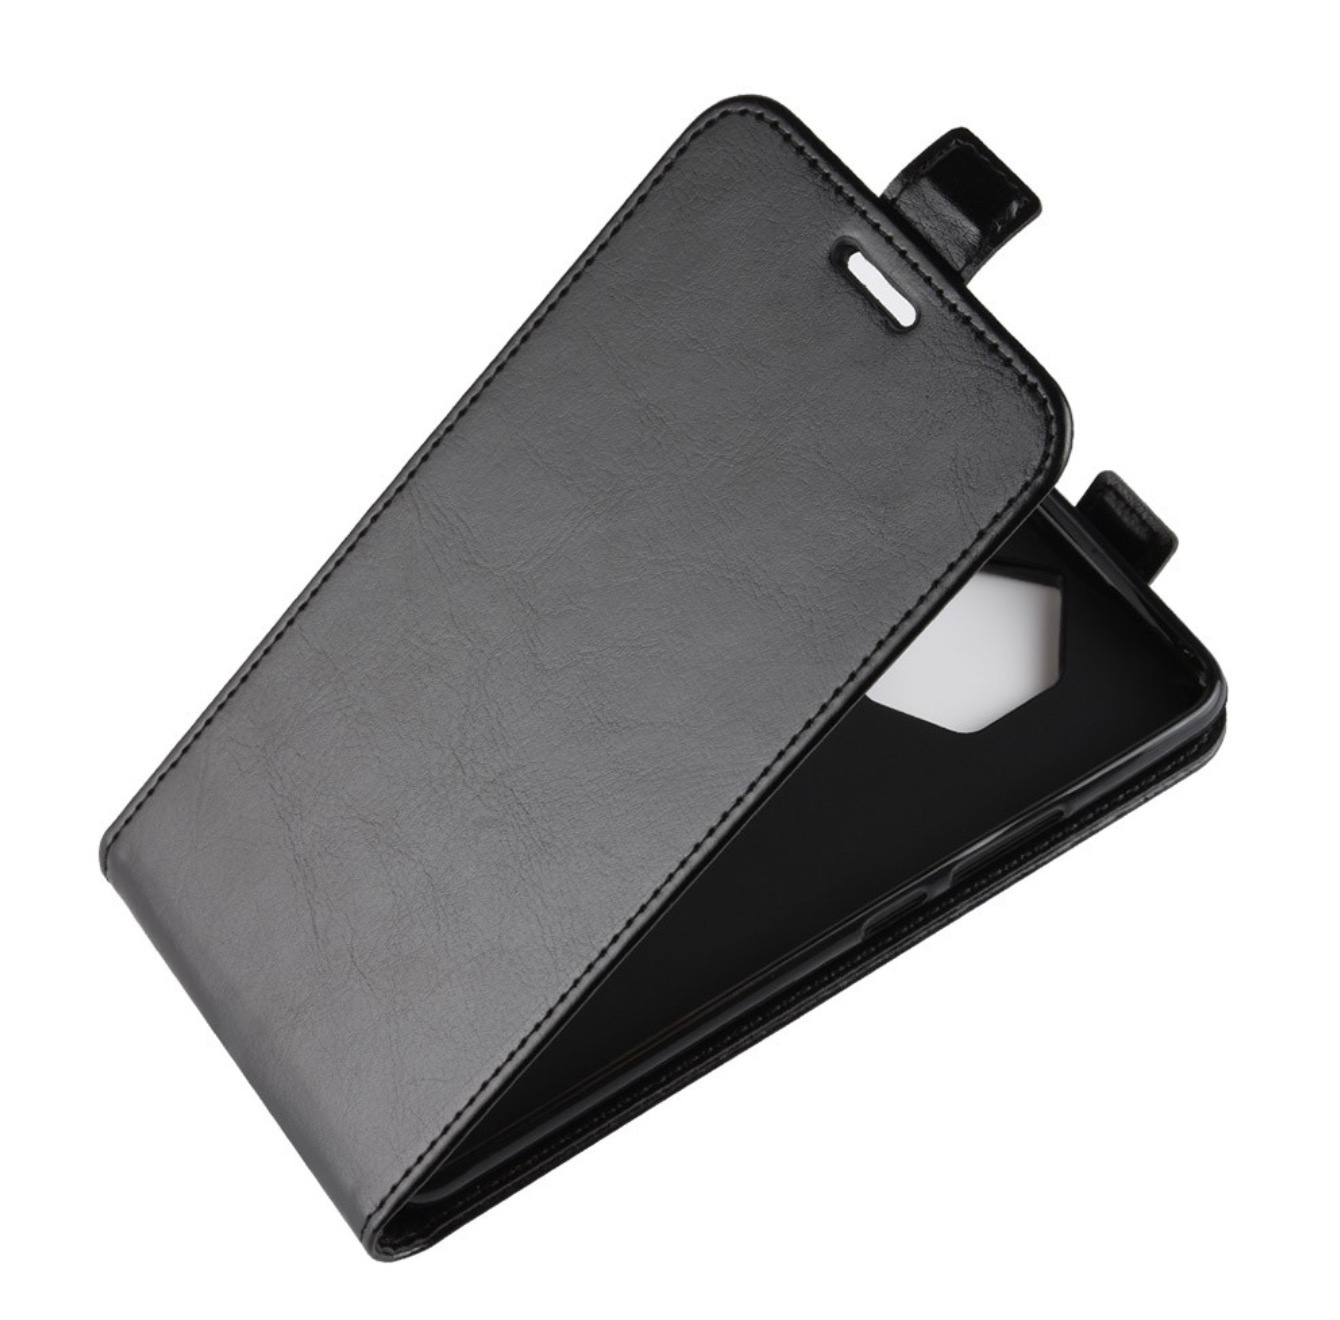 Чехол-флип MyPads для HTC One mini 2 вертикальный откидной черный аккумулятор для телефона craftmann b0p6m100 для htc one mini 2 m5 one m8 mini one remix